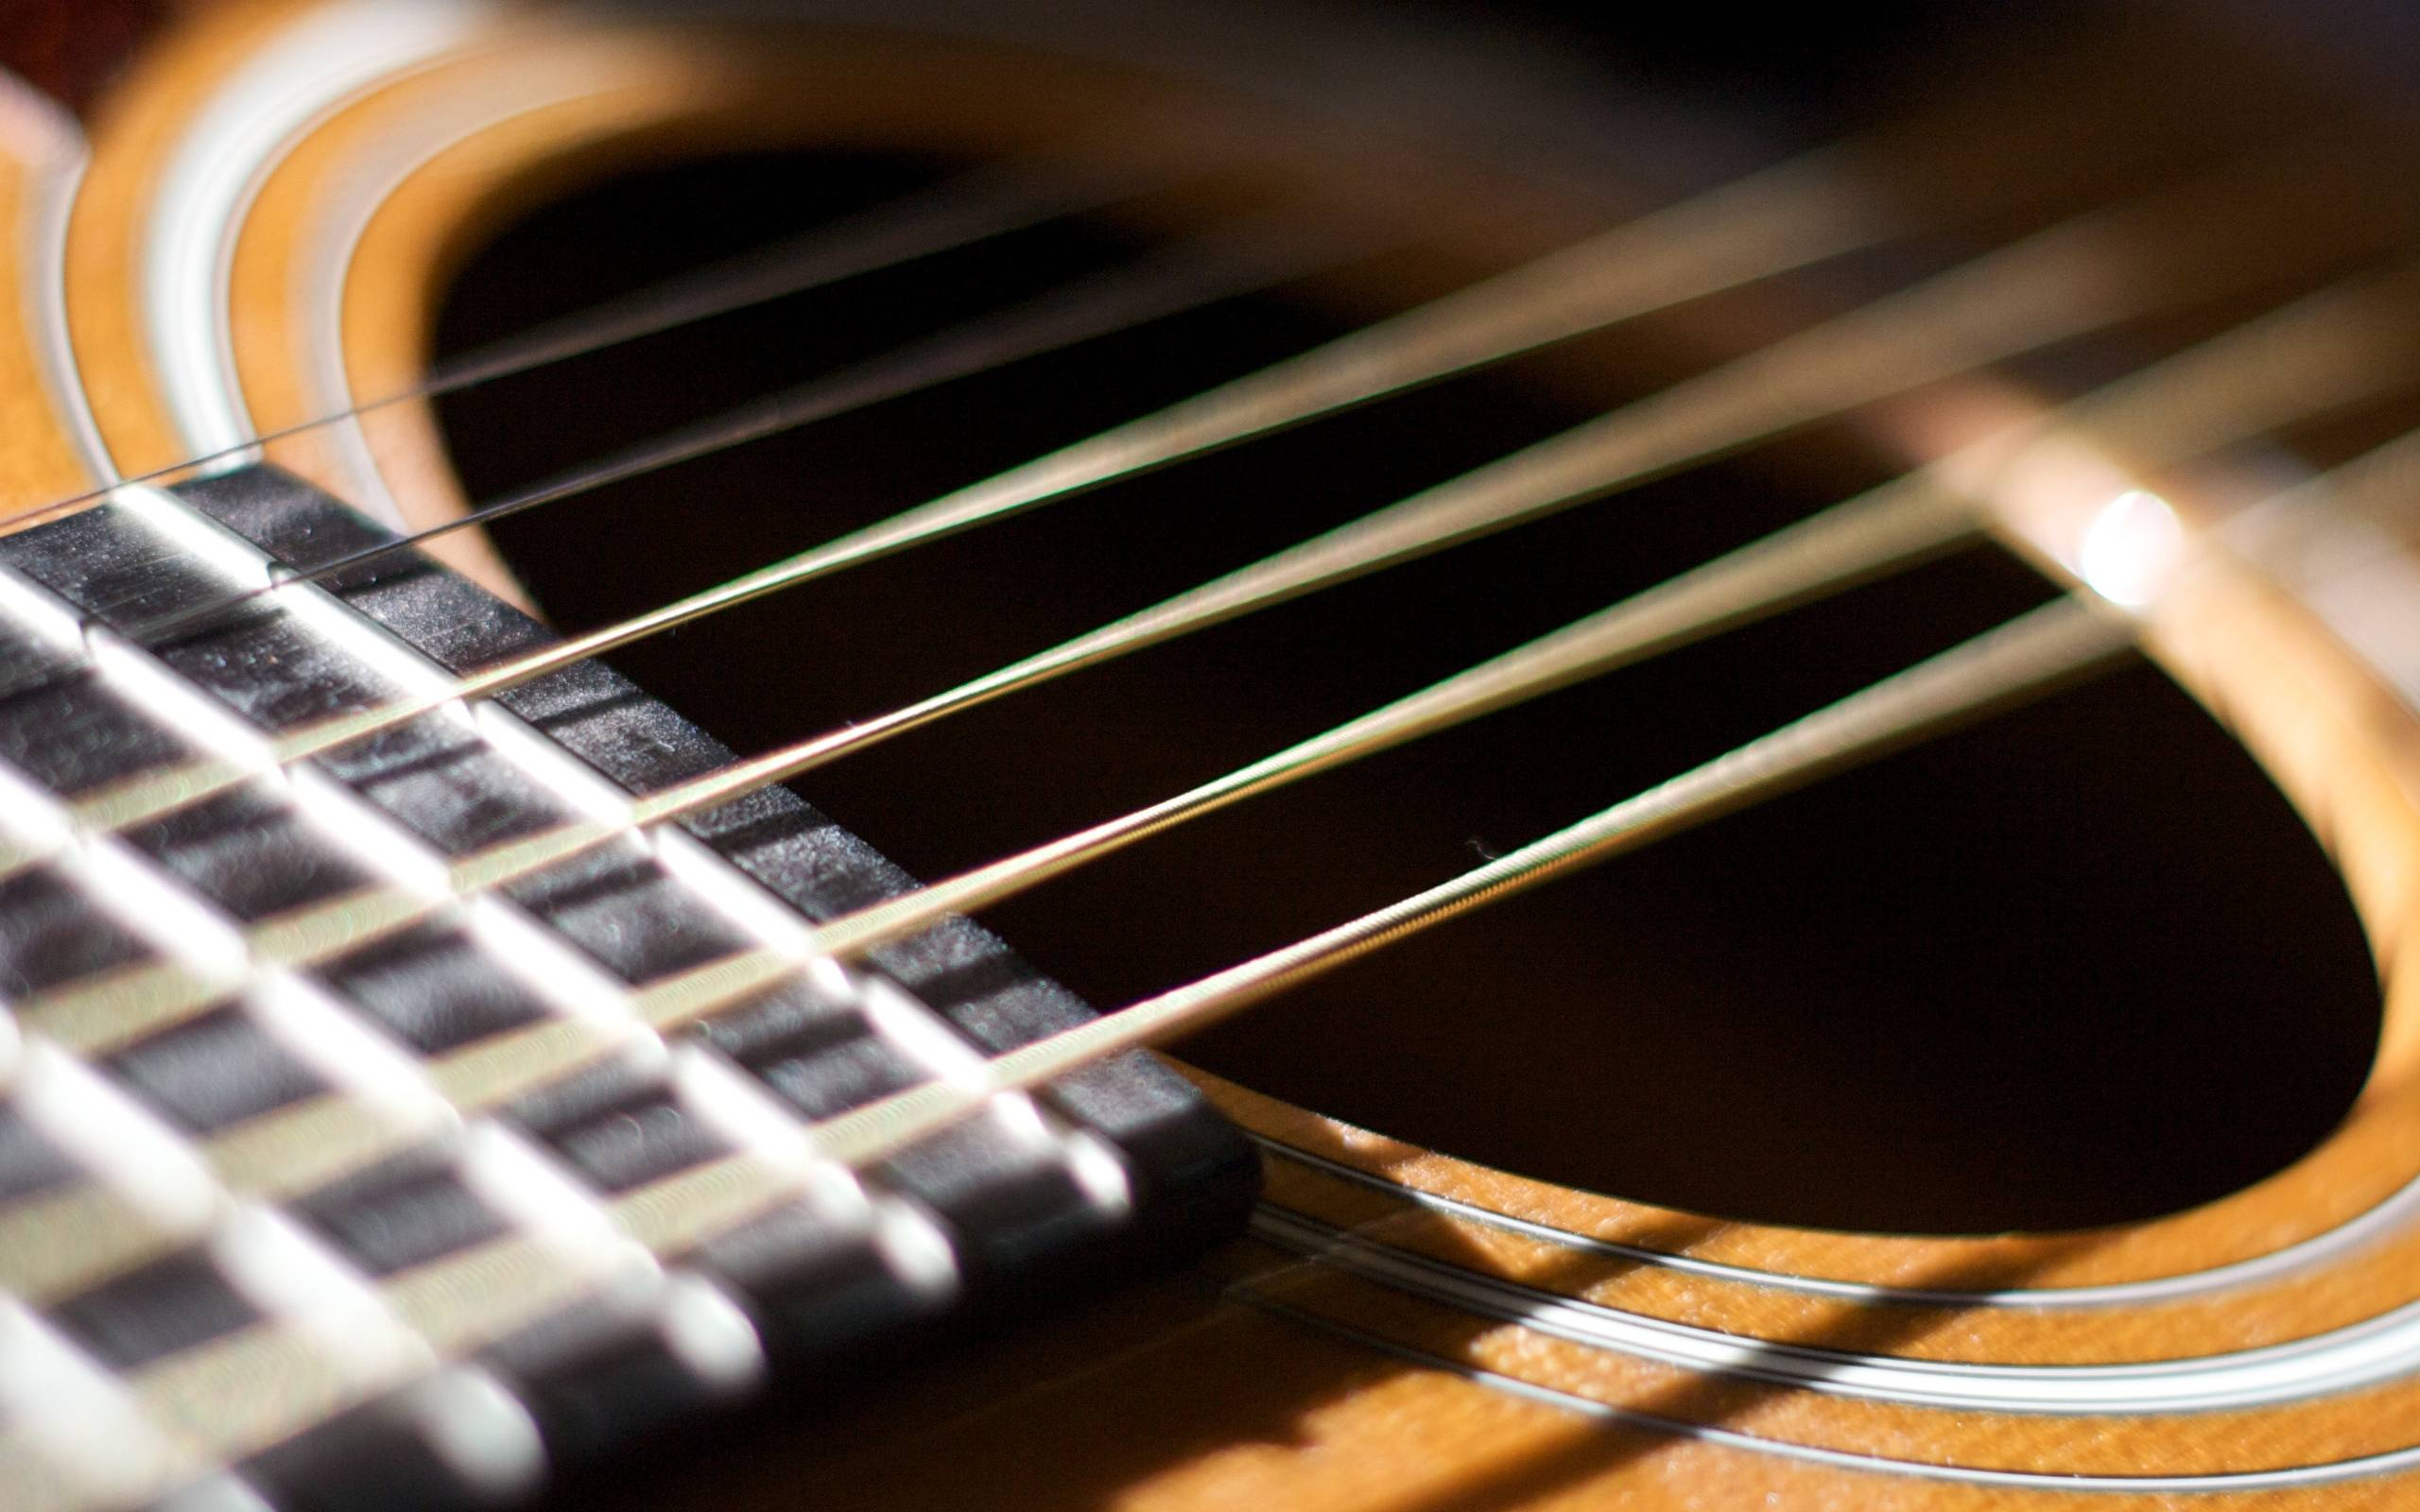 Acoustic Guitar Wallpapers Top Free Acoustic Guitar